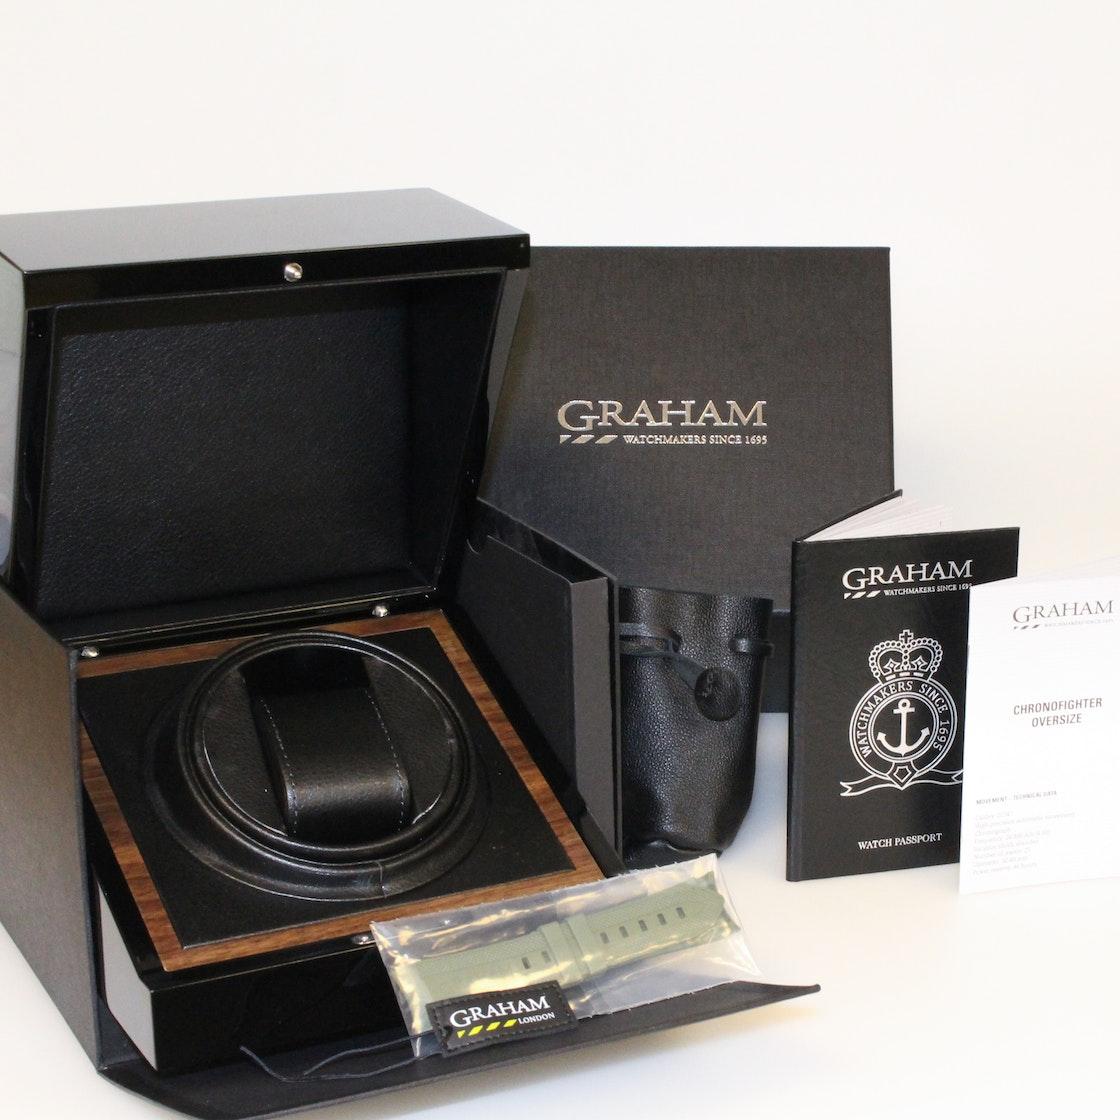 Graham Chronofighter Oversize Chronograph 2CCAU.G01A.T15